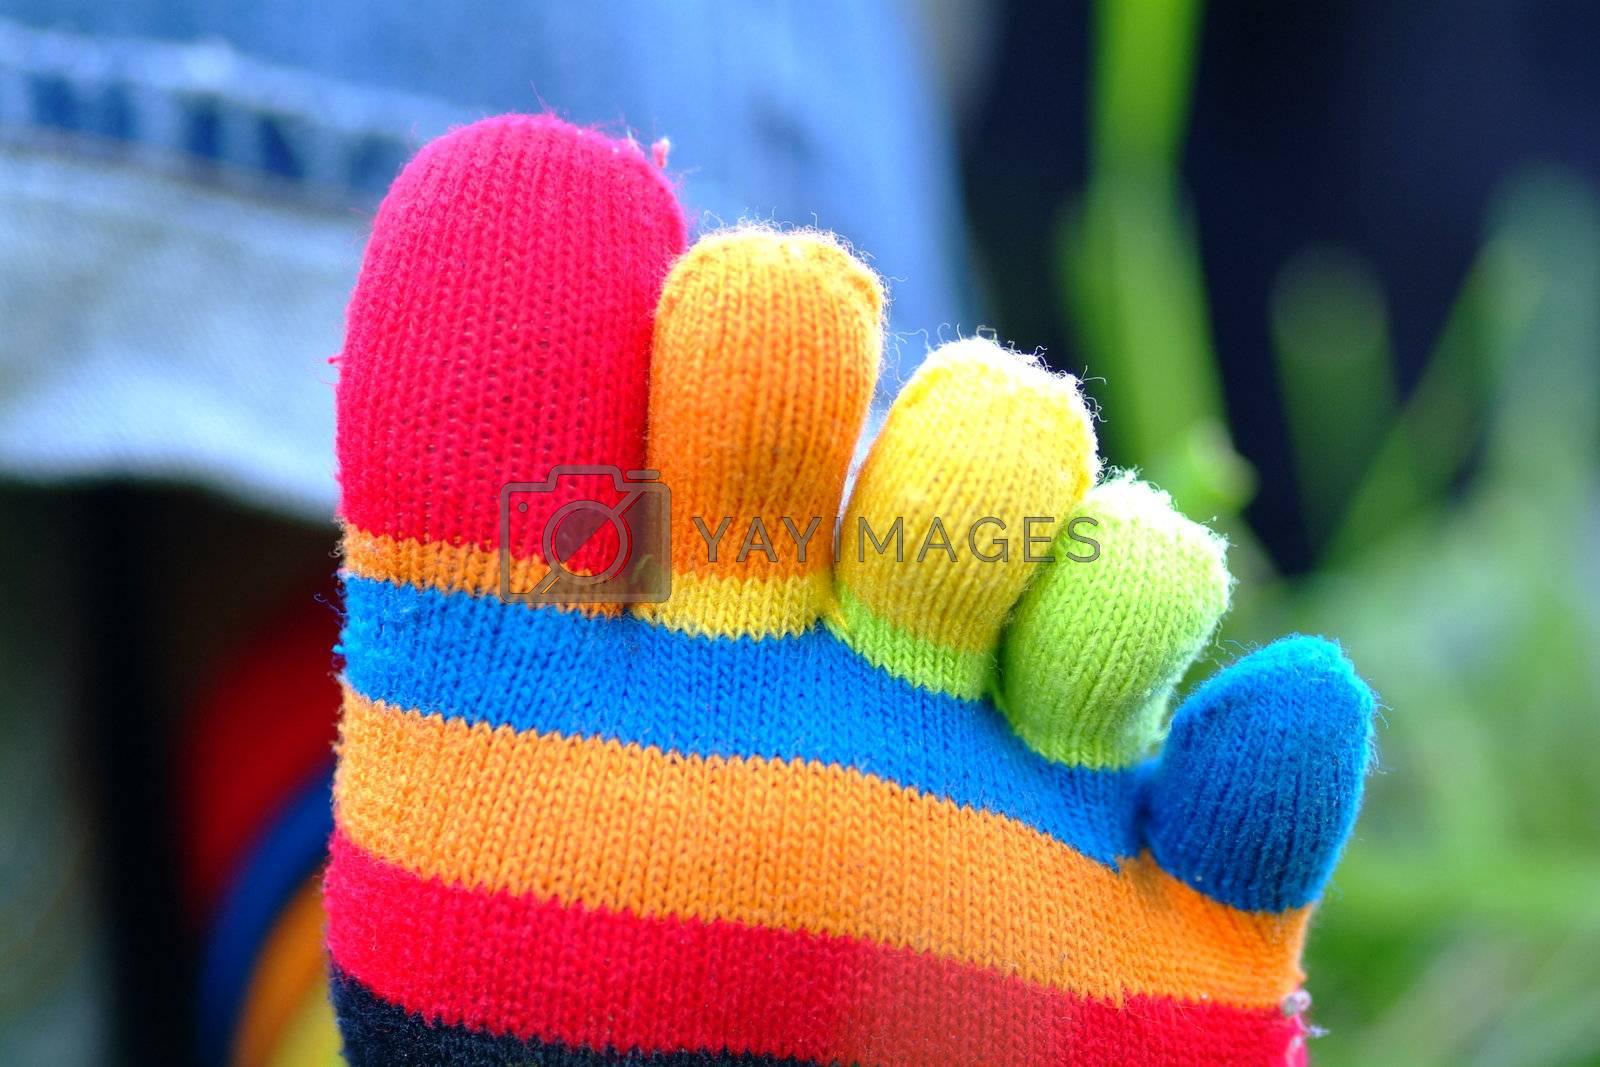 toesocks 4 | toesocks 4 by fotofritz